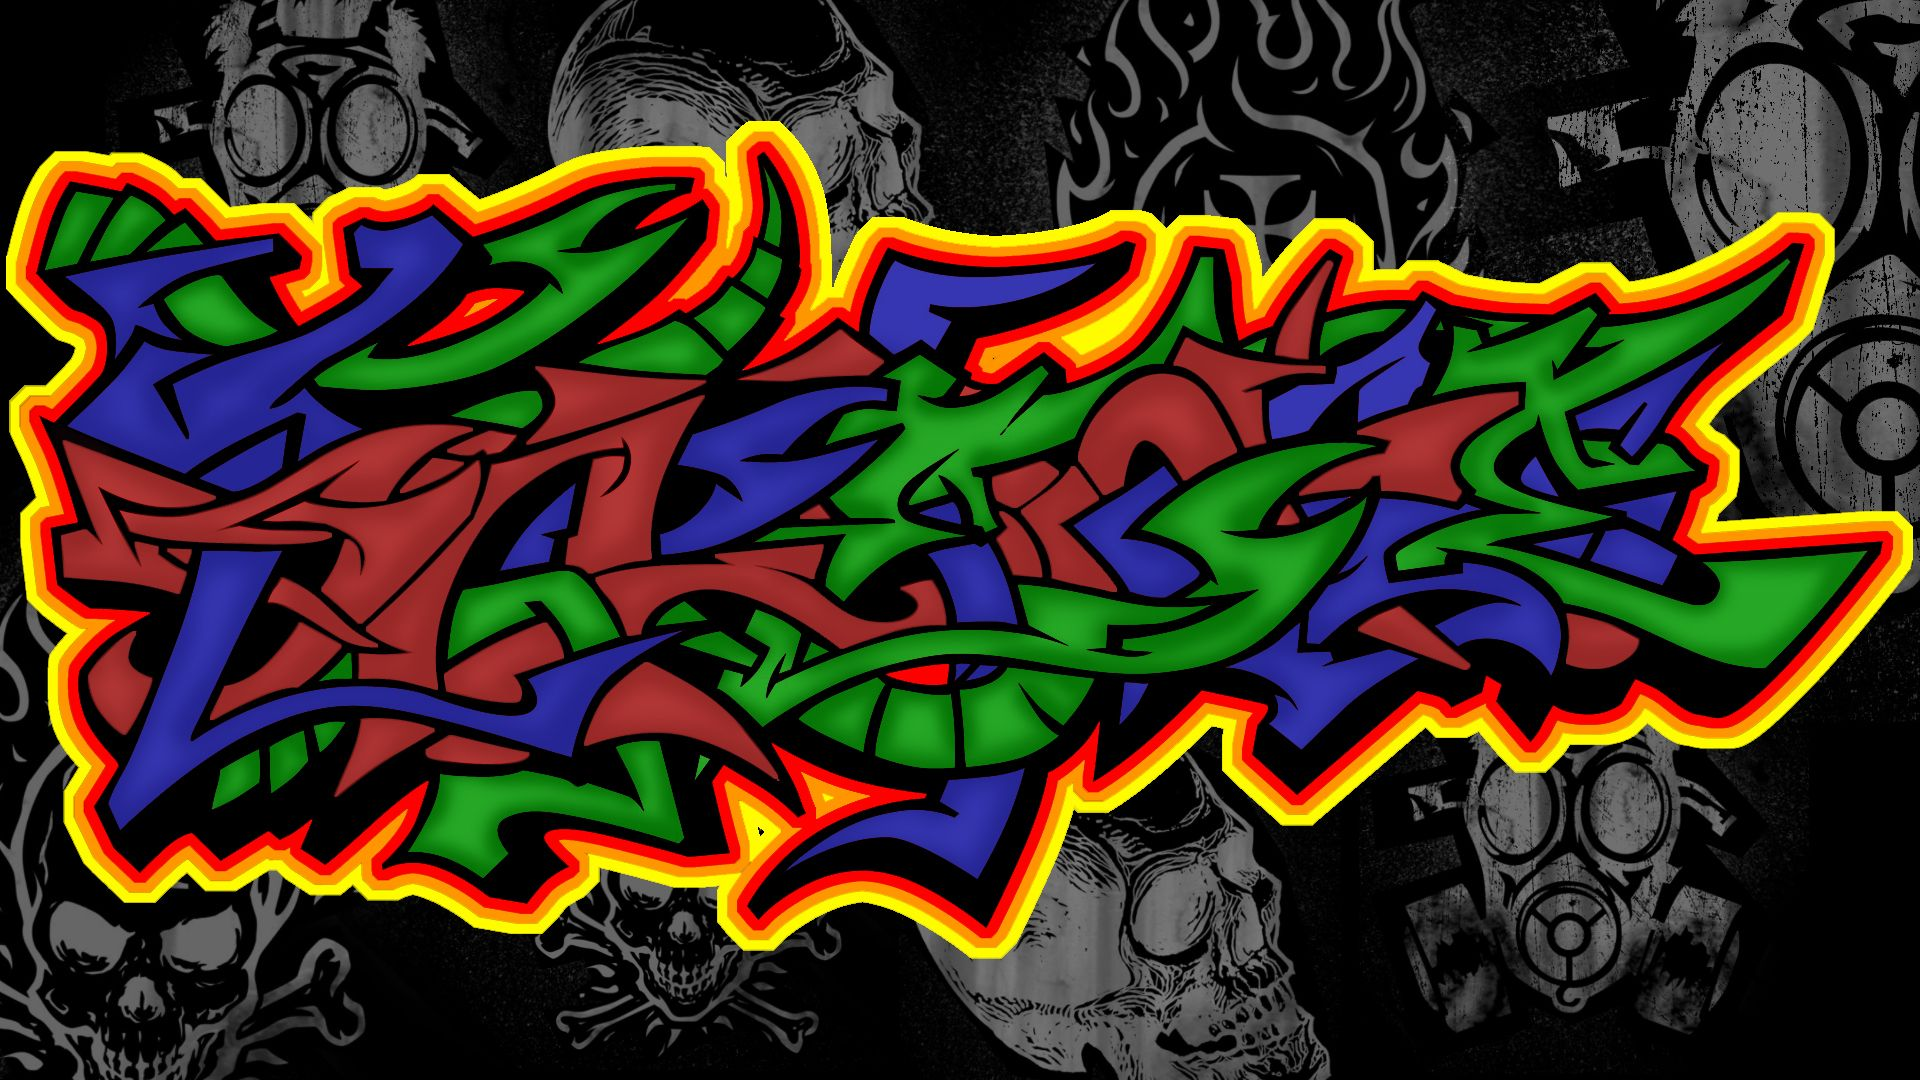 Global Graffiti, Street Art